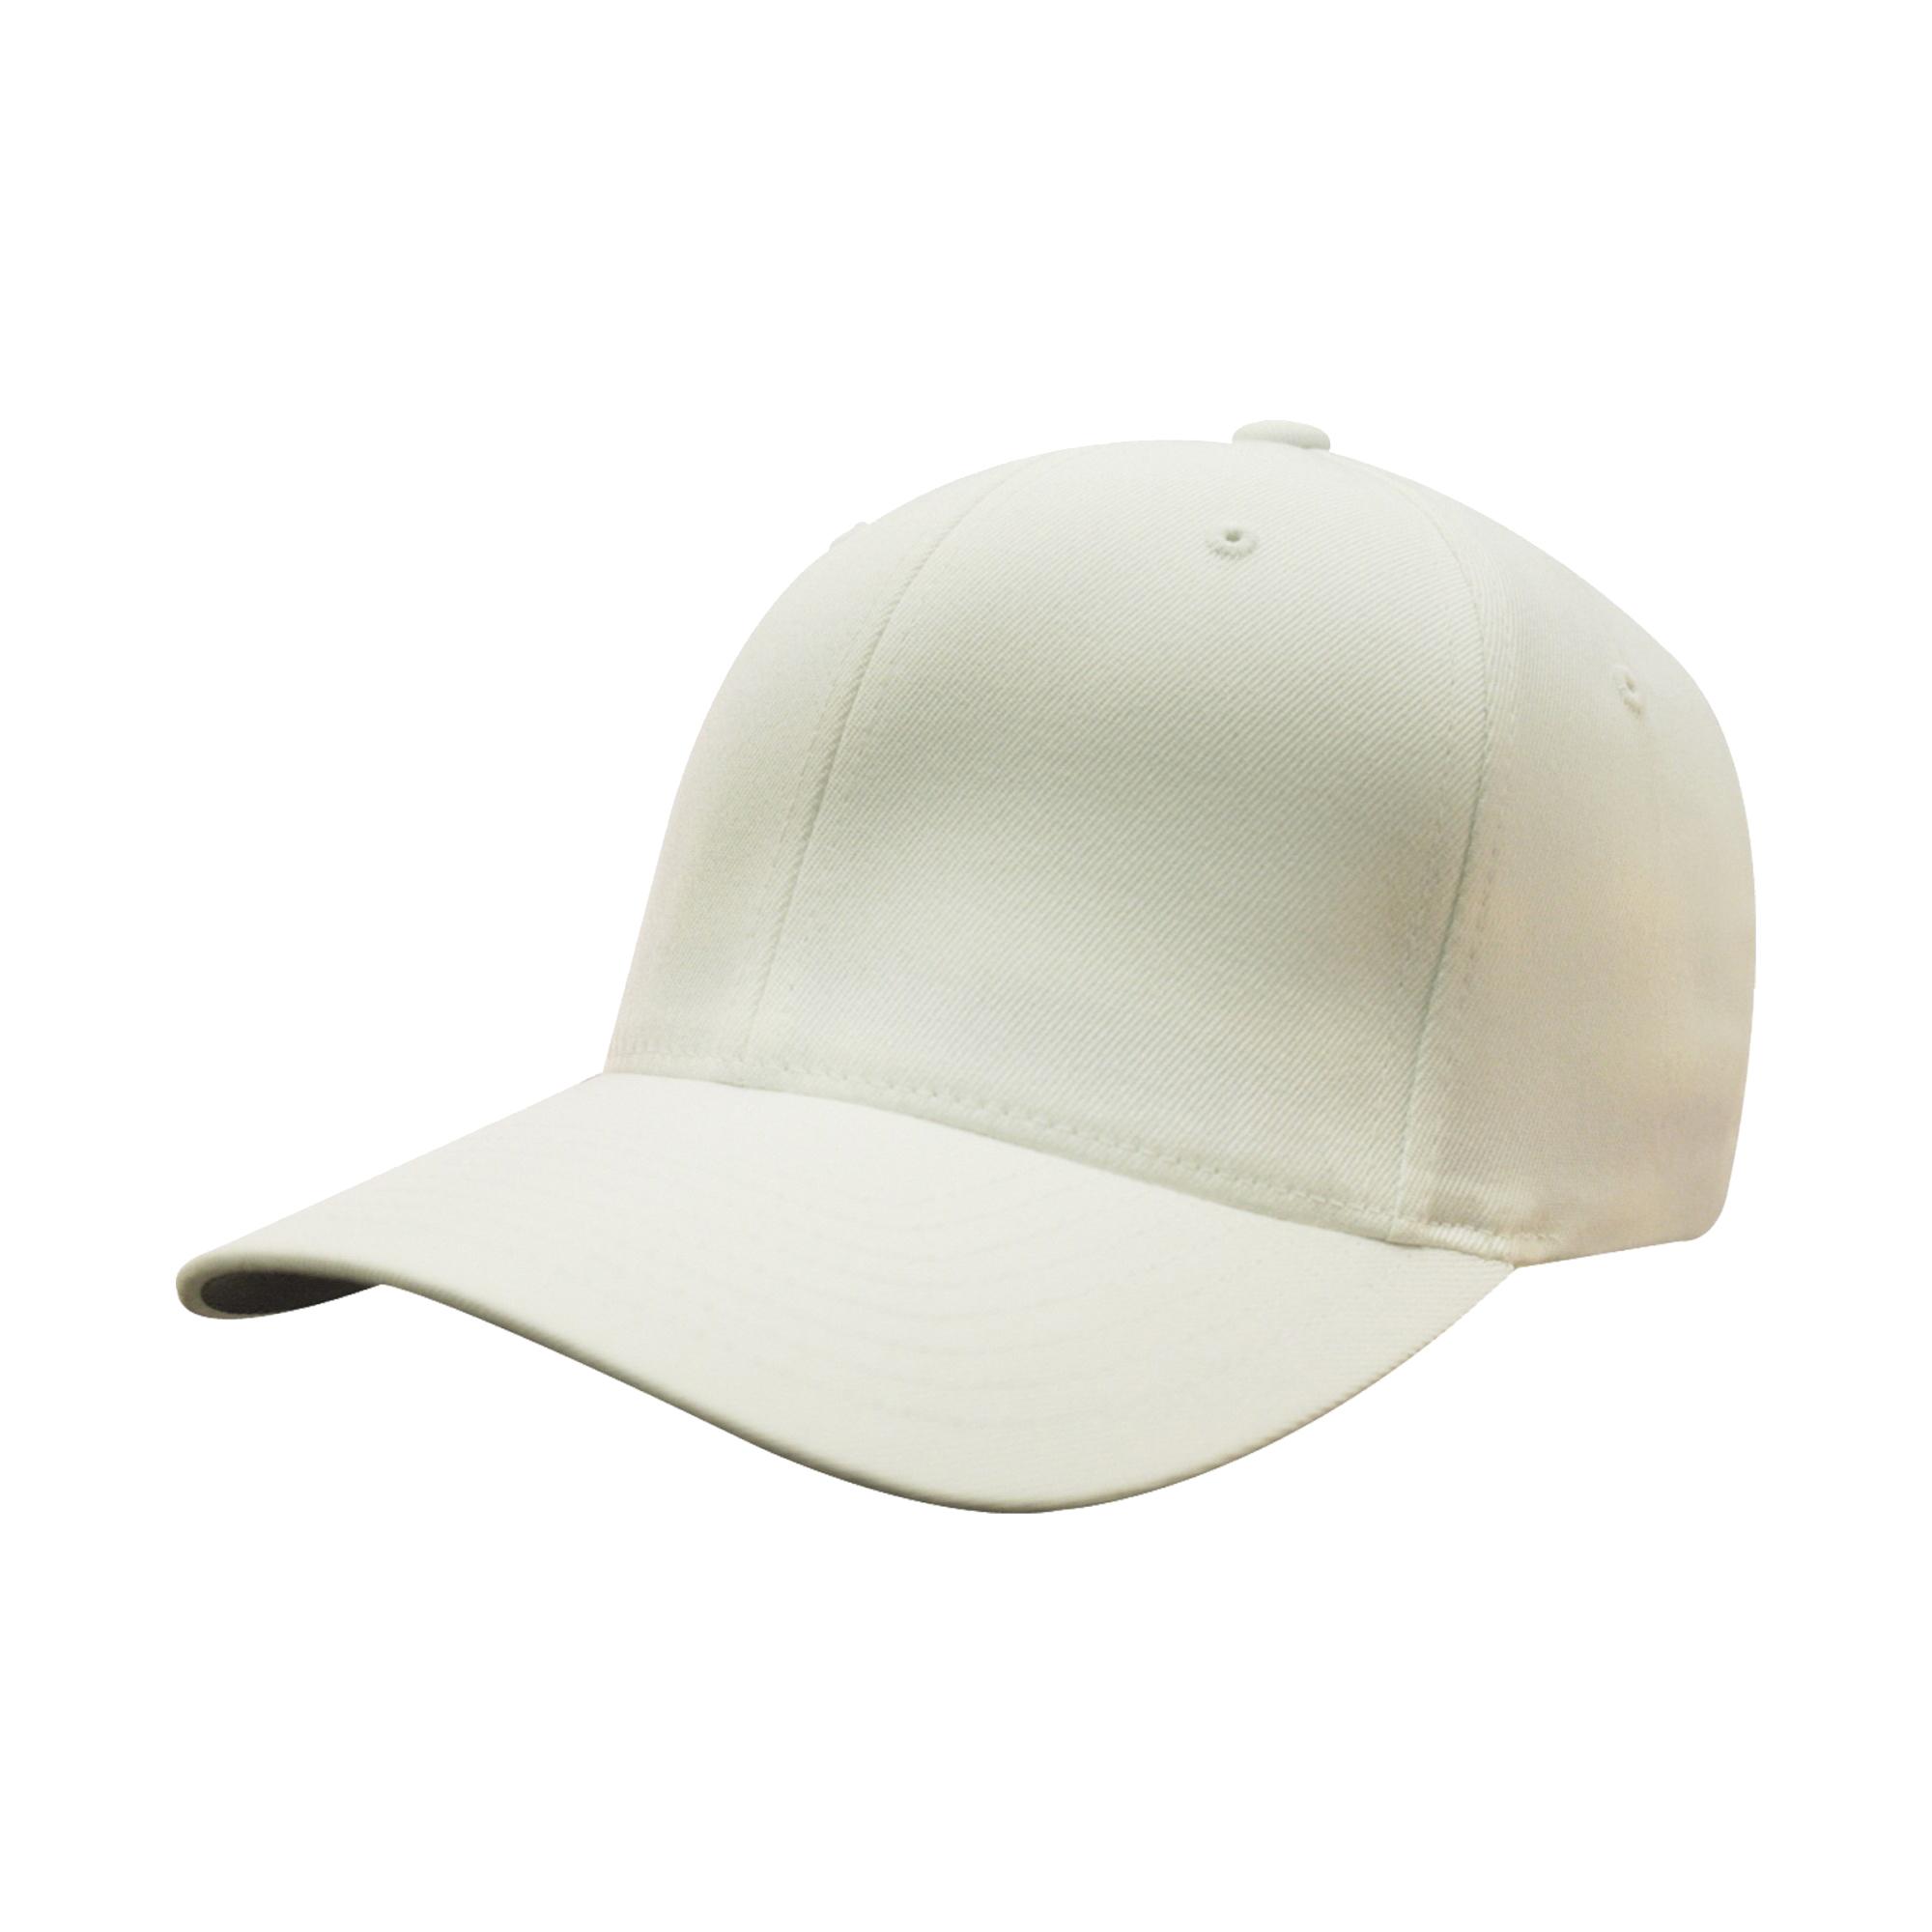 yupoong mens flexfit fitted summer baseball cap rw2889 ebay. Black Bedroom Furniture Sets. Home Design Ideas